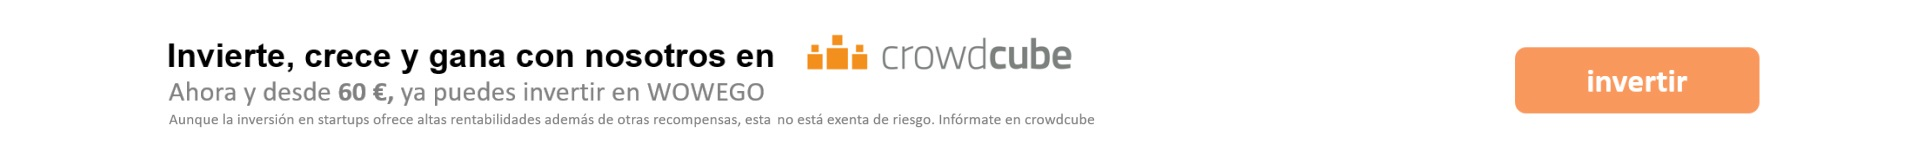 Invertir CrowdCube Wowego fitness app